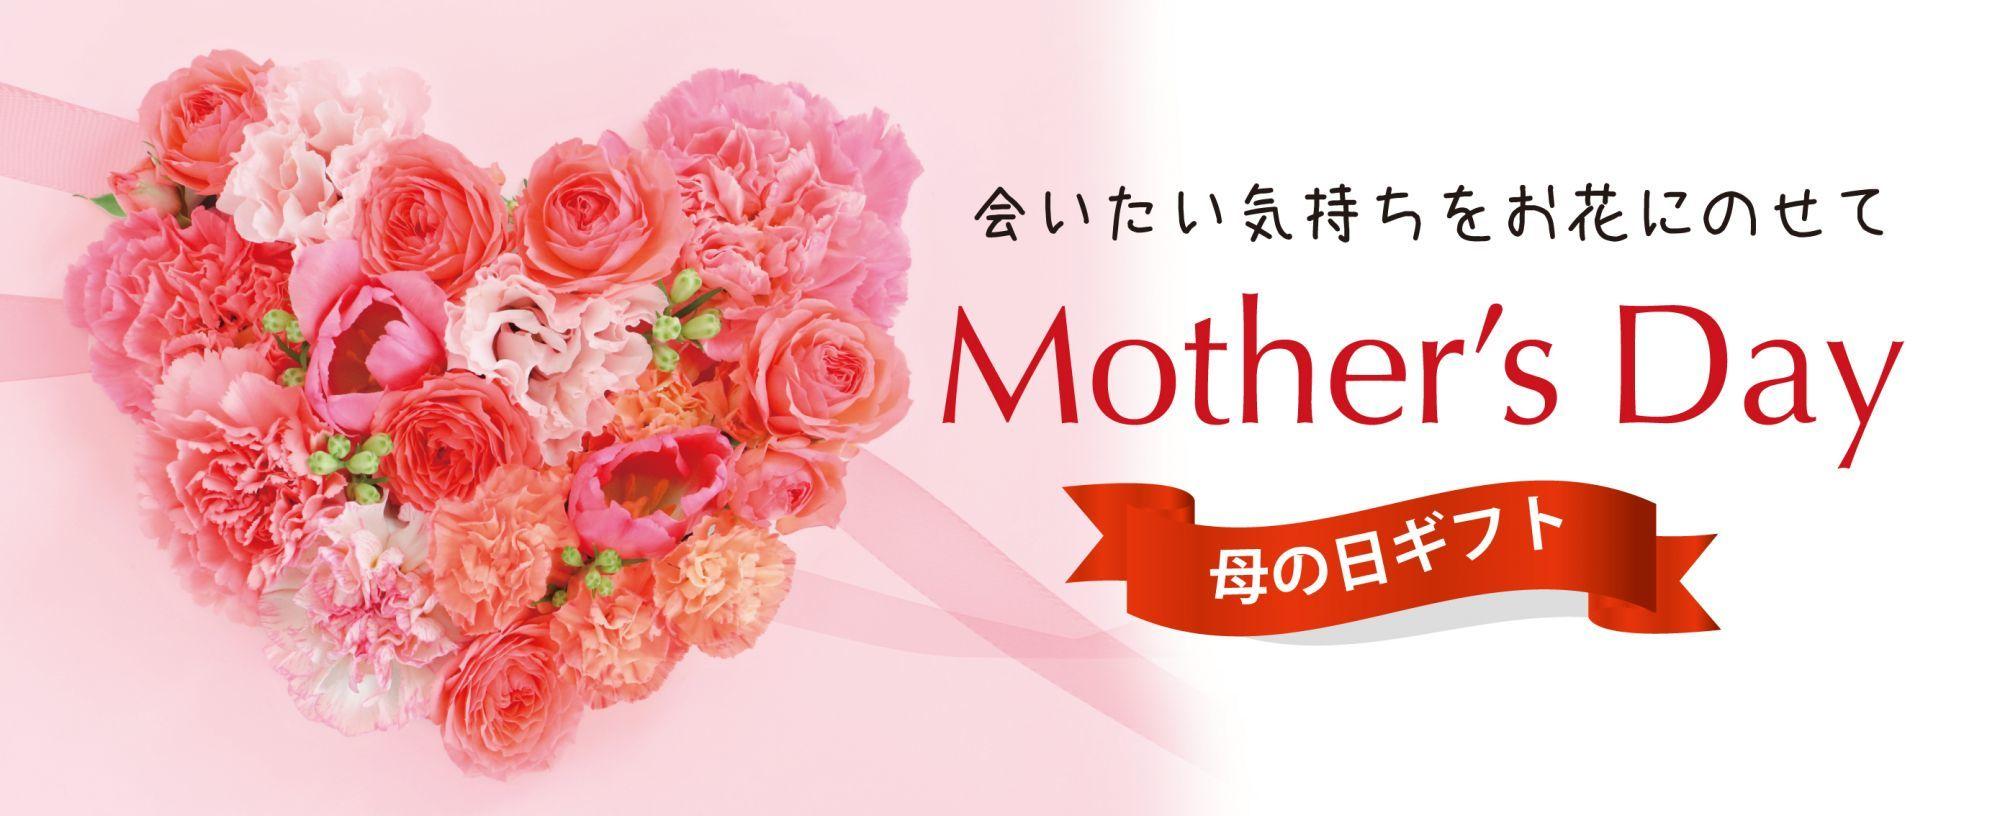 Mother's Day 会いたい気持ちをお花にのせて